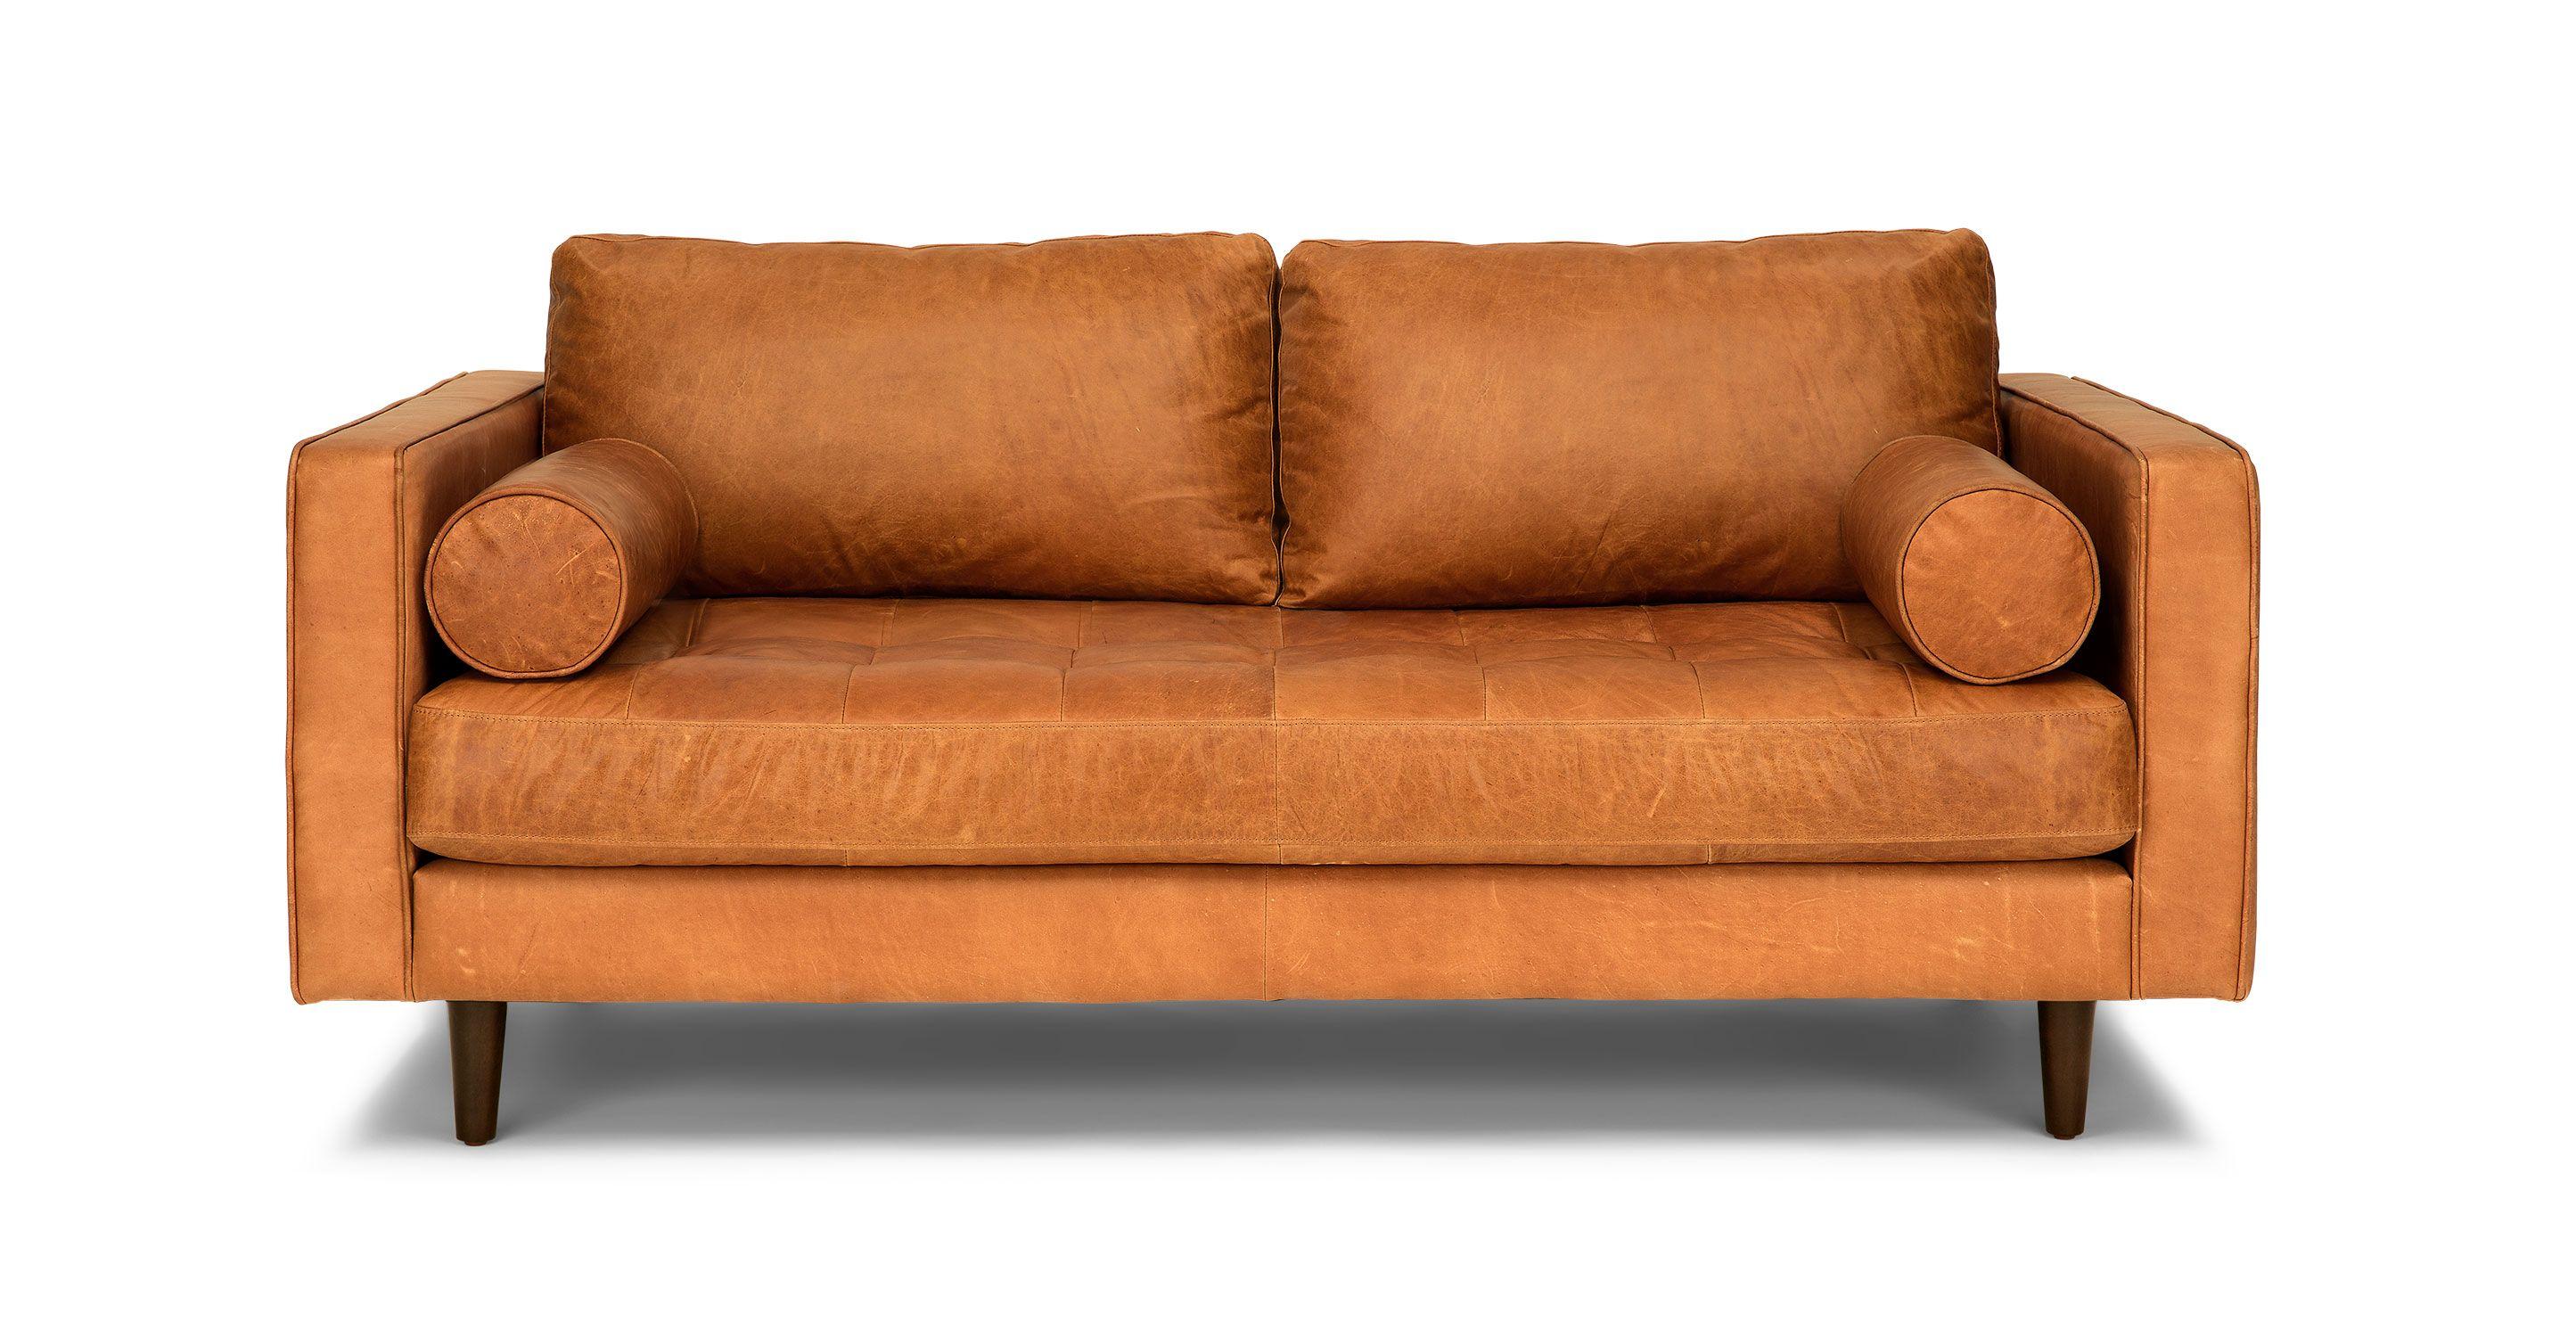 Best Tan Brown Leather Sofa 72 Wide Italian Leather 640 x 480